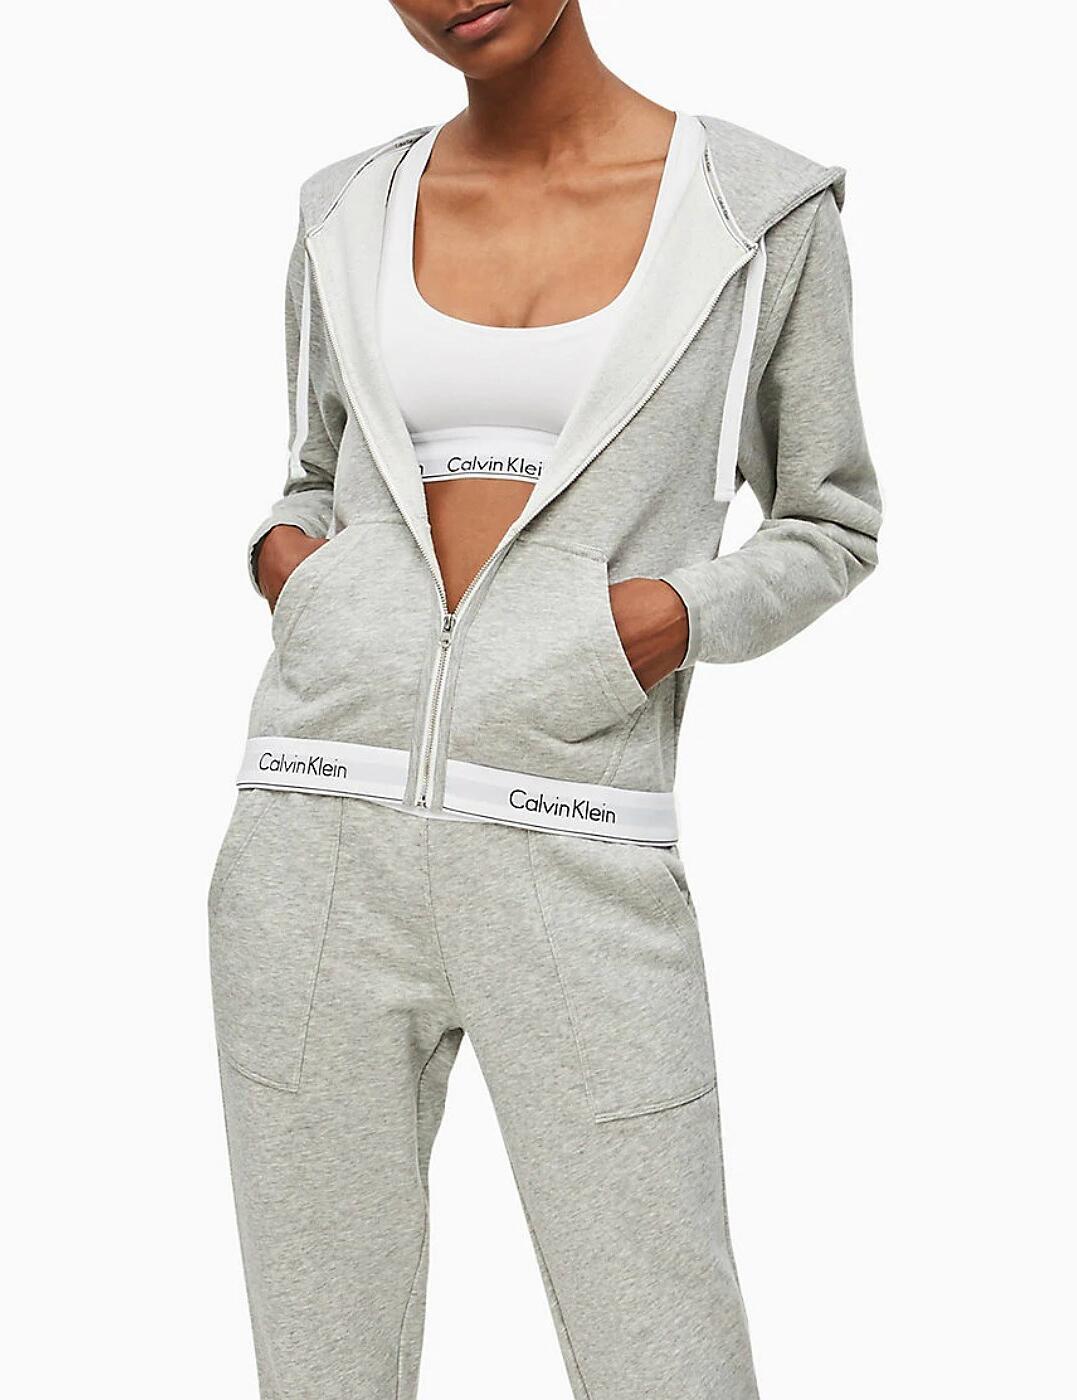 QS5667E Calvin Klein Modern Cotton Lounge Hoodie - QS5667E Grey Heather